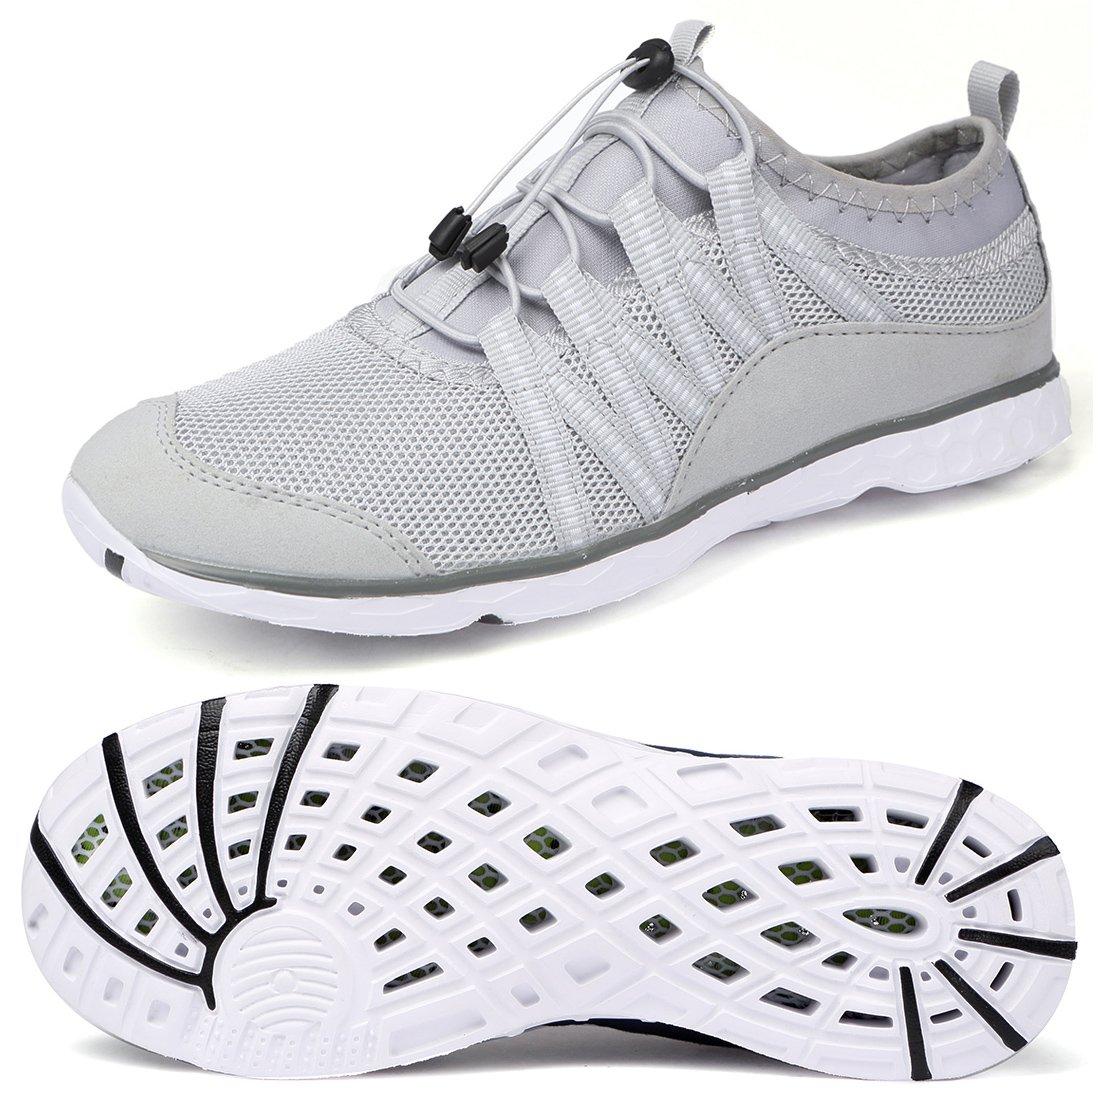 Aqua Beach Water Shoes Quick Drying Barefoot Yoga Socks Surf Swim Shoes for Women Men for Outdoor Water Sports